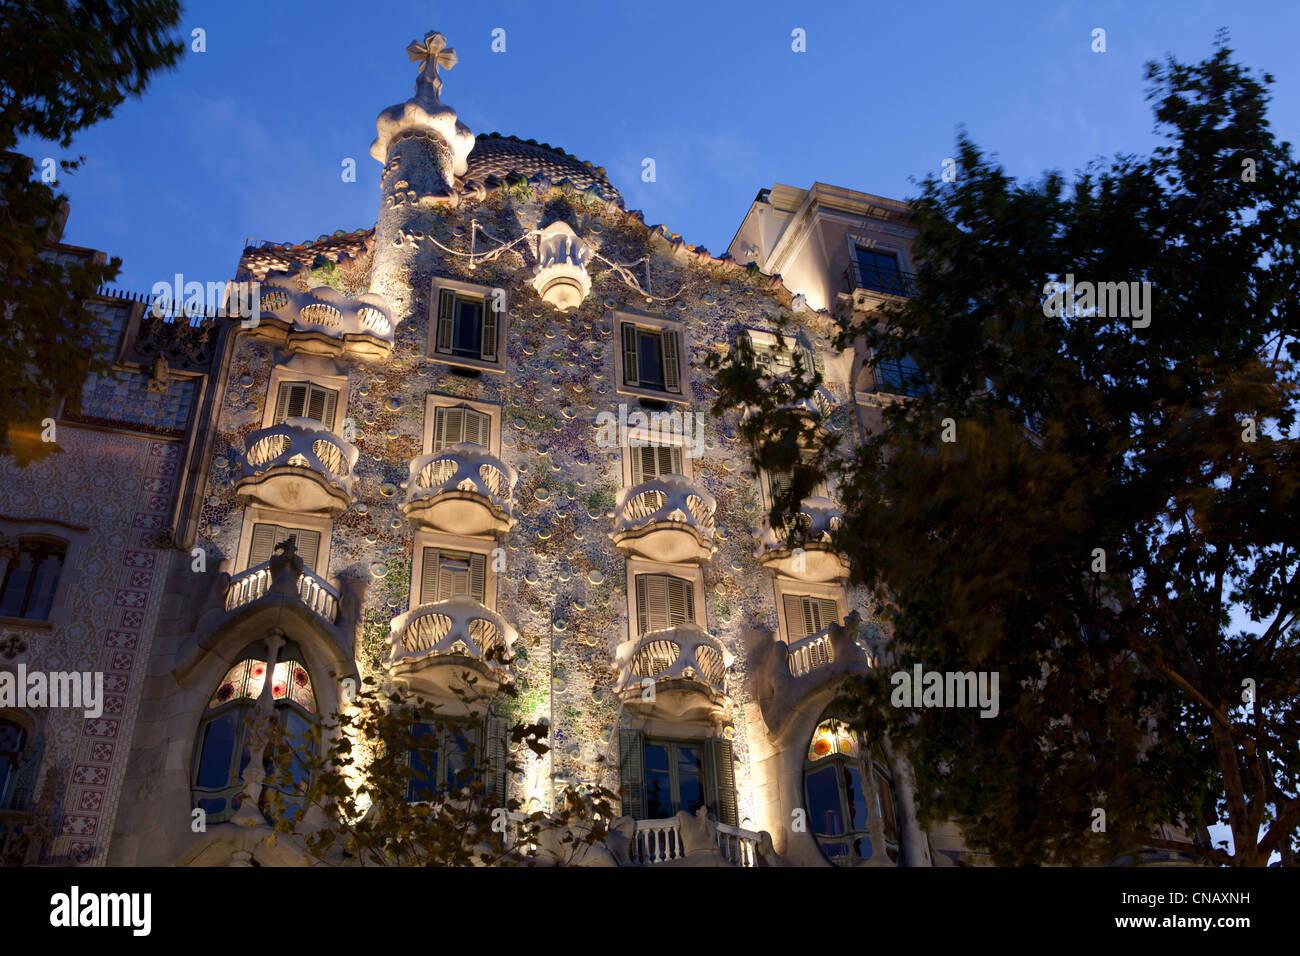 Gaudi building lit up at night - Stock Image